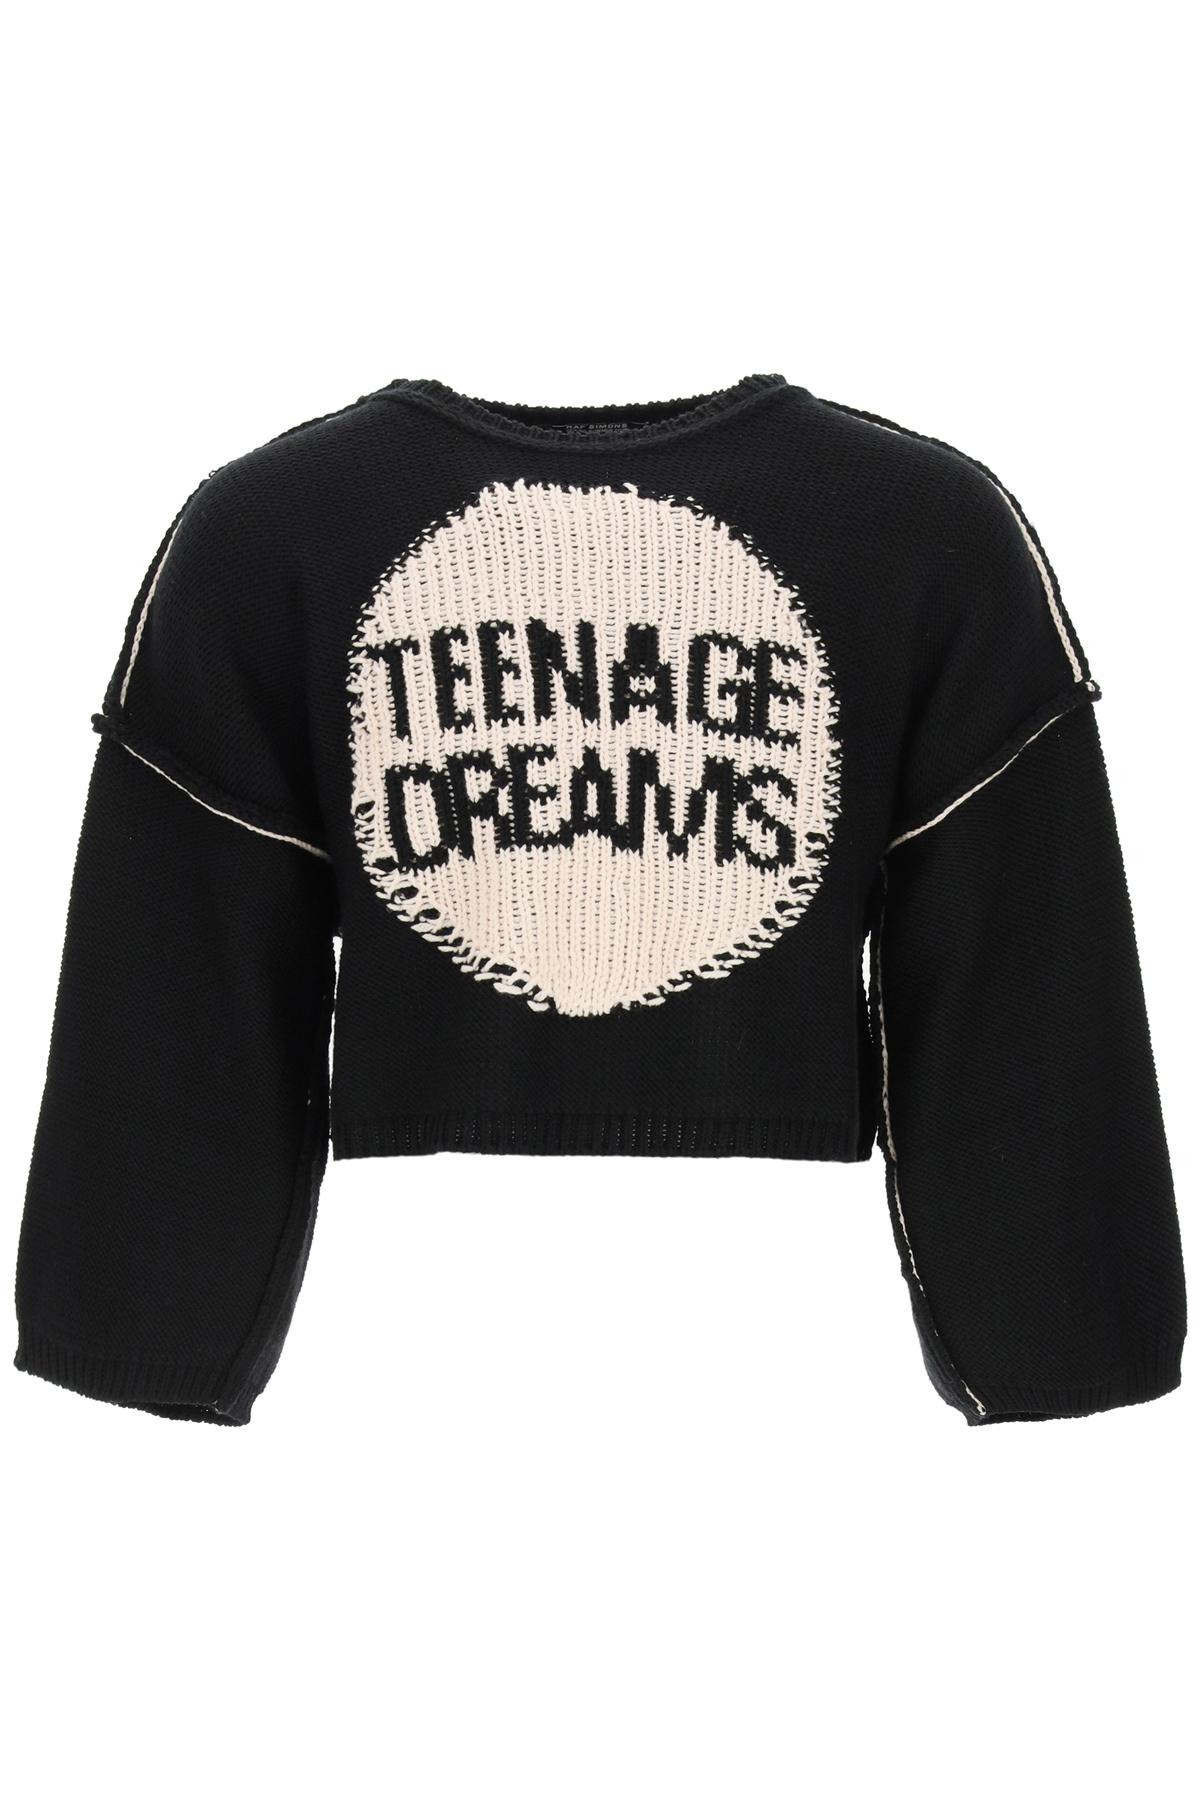 Raf simons pullover oversize ricamo teenage dreams